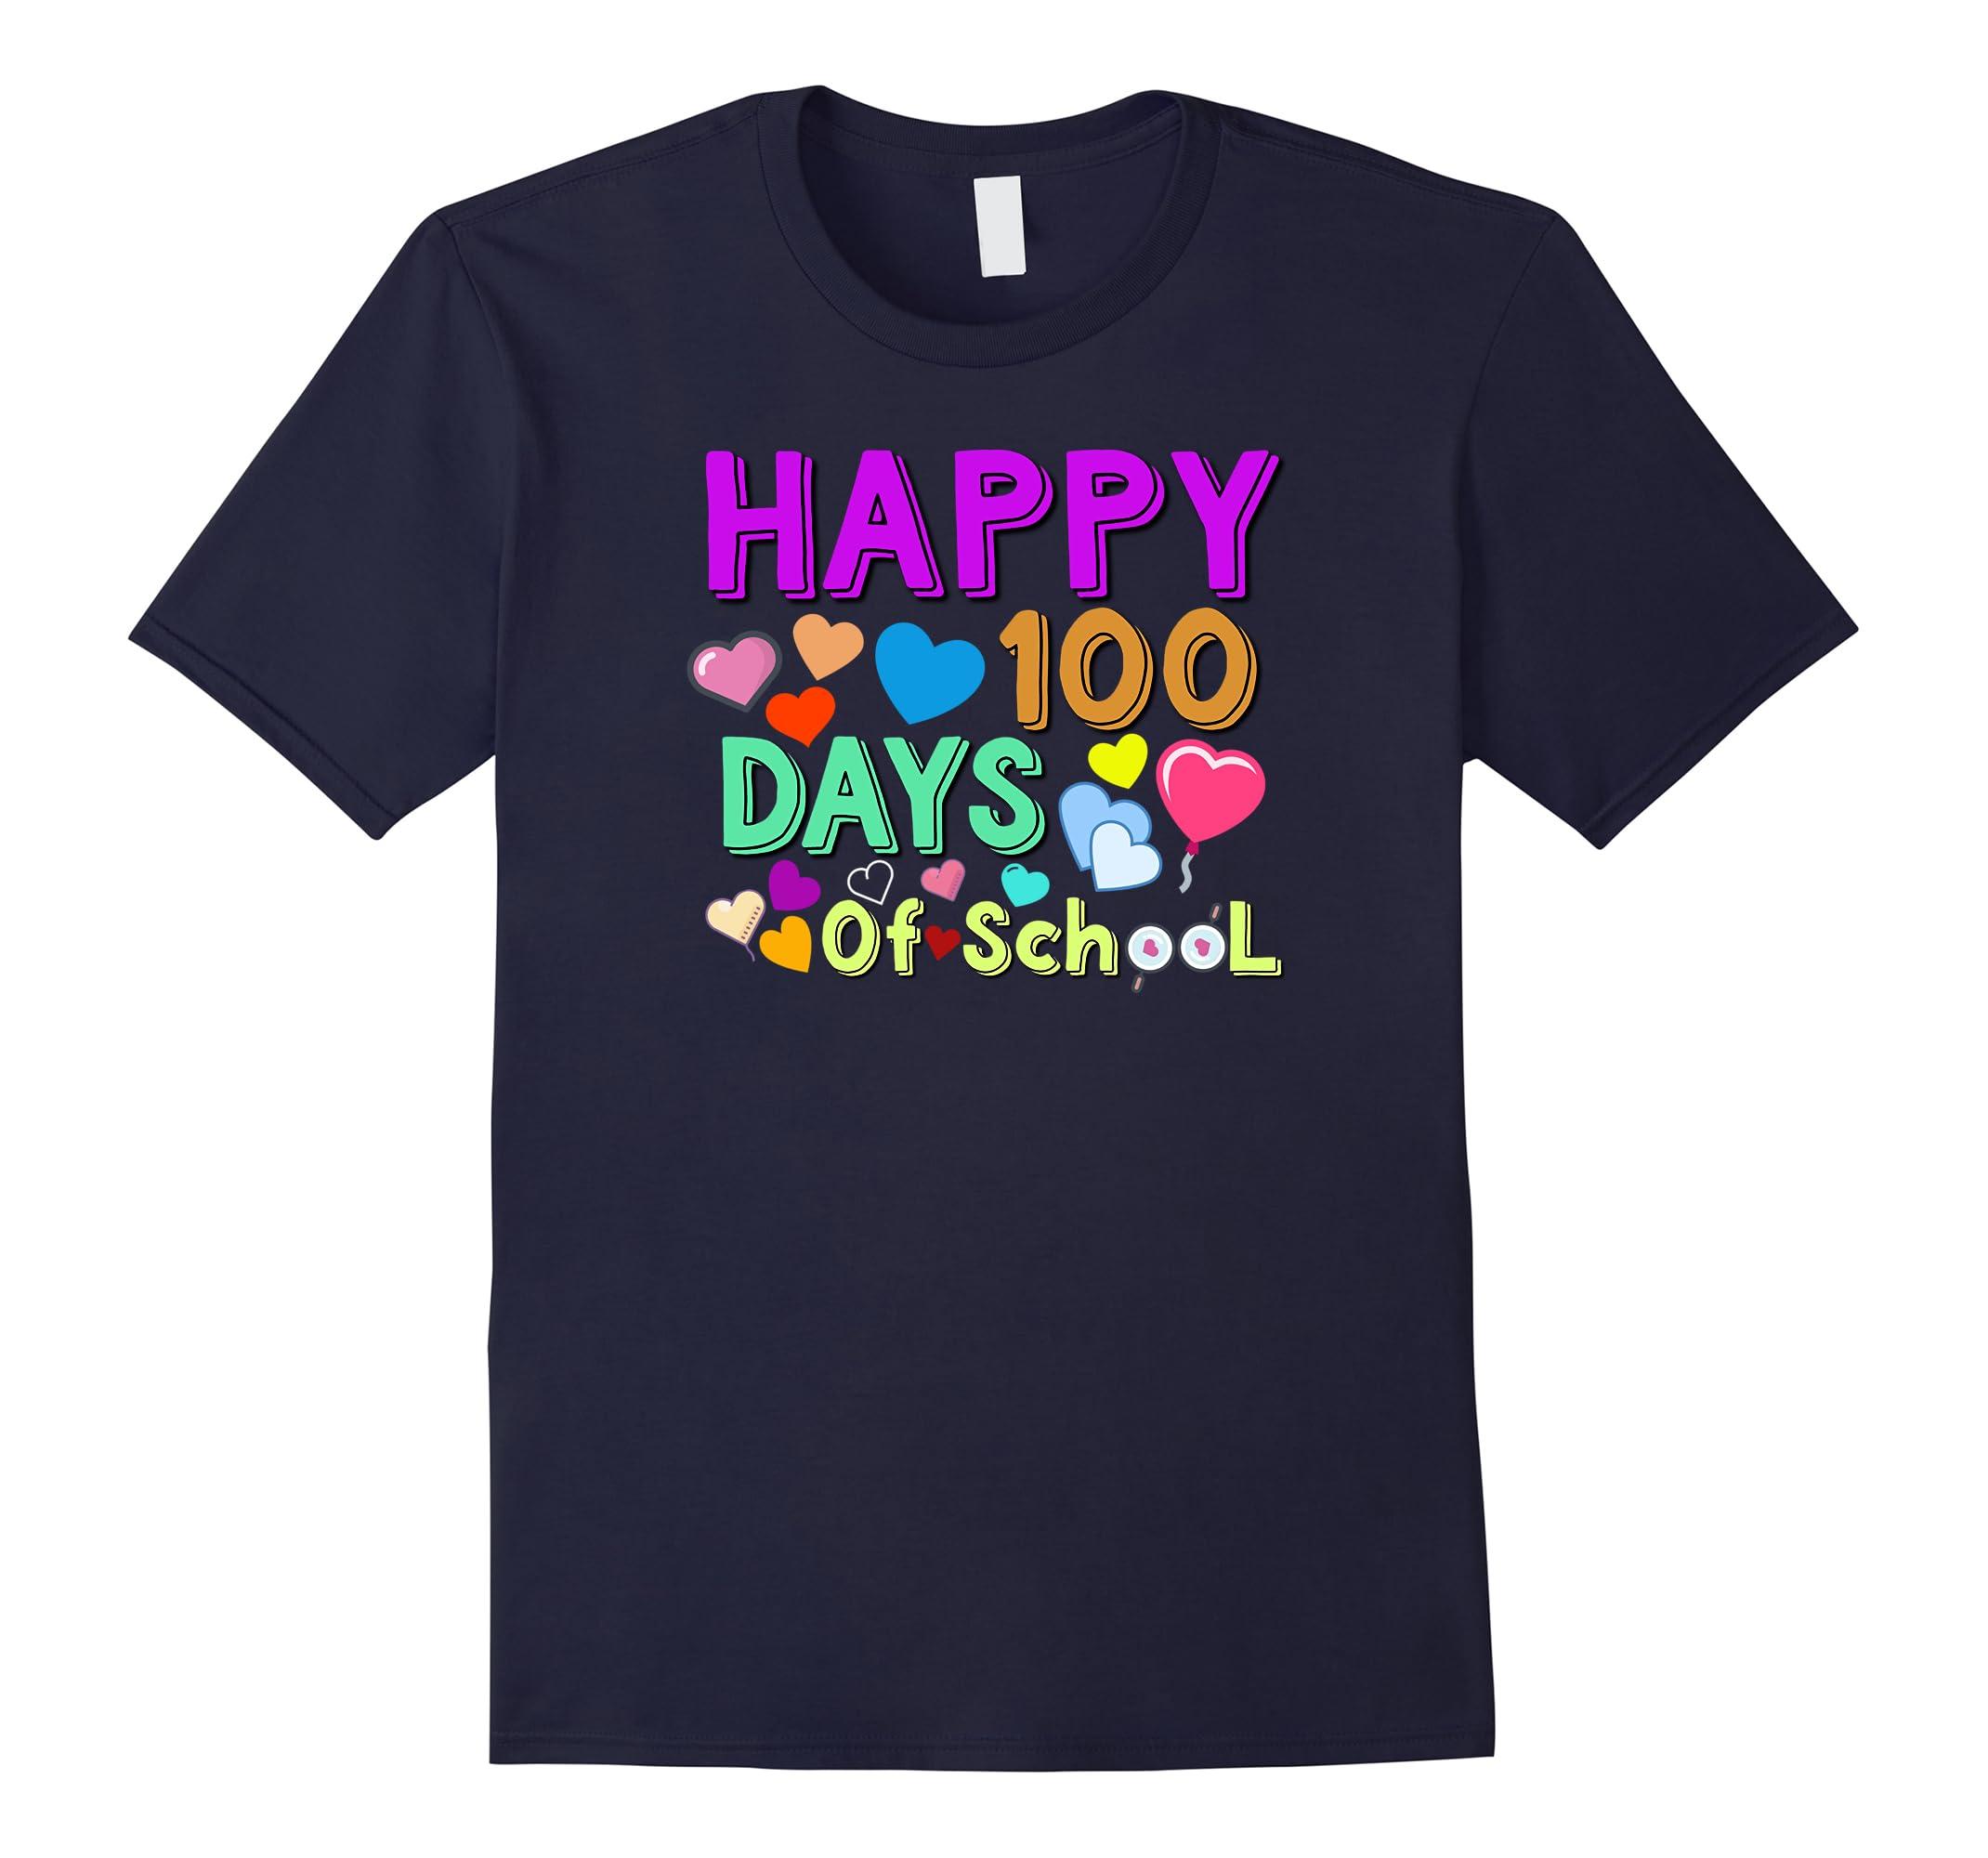 100th Day of School Shirt | Happy 100 Days Of School T-shirt-RT